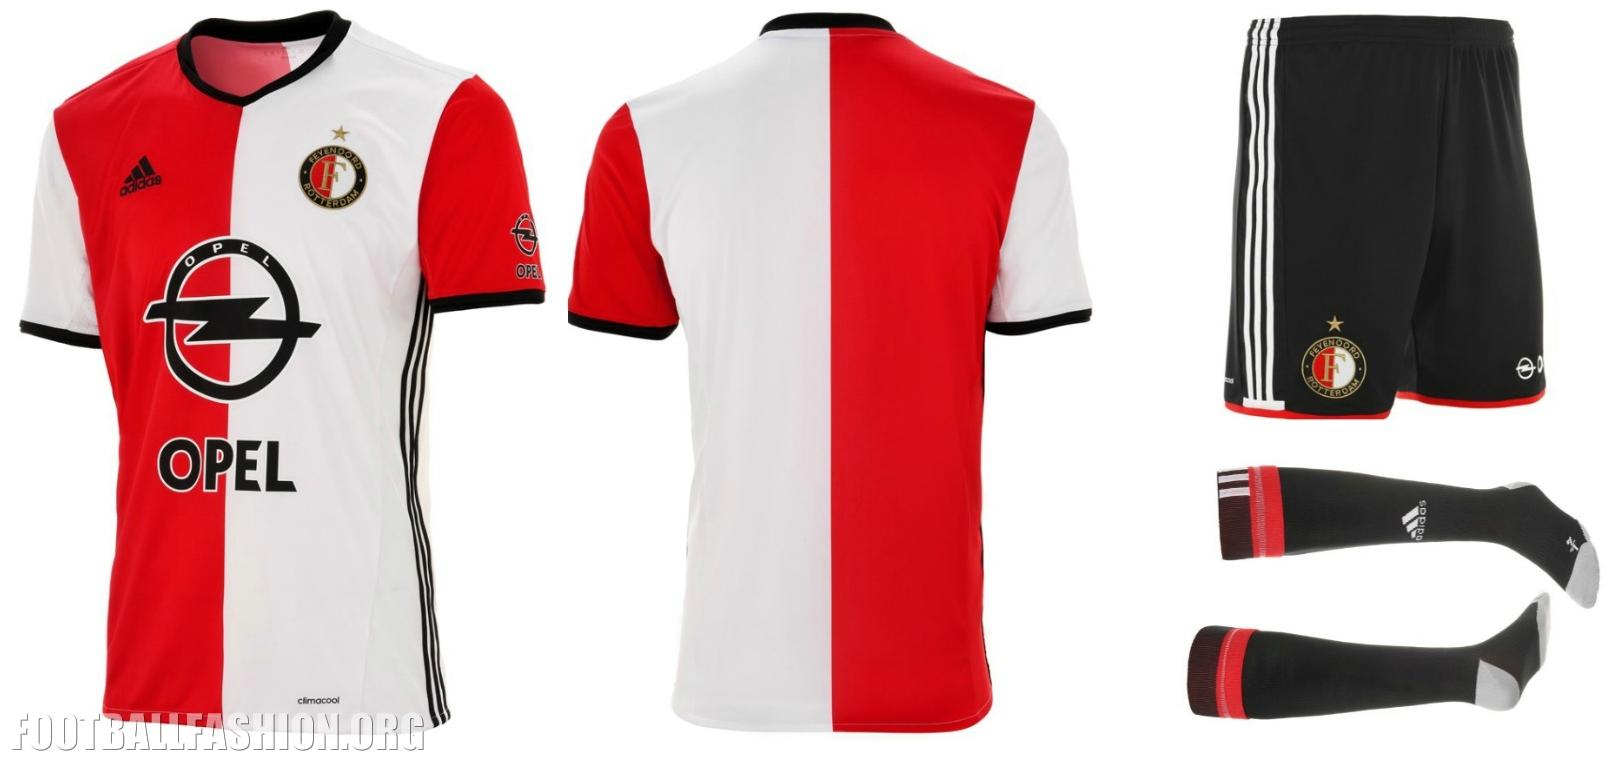 ... adidas Home Football Kit, Soccer Jersey, Shirt, Thuistenue, Thuisshirt: footballfashion.org/wordpress/2016/06/26/feyenoord-rotterdam-201617...